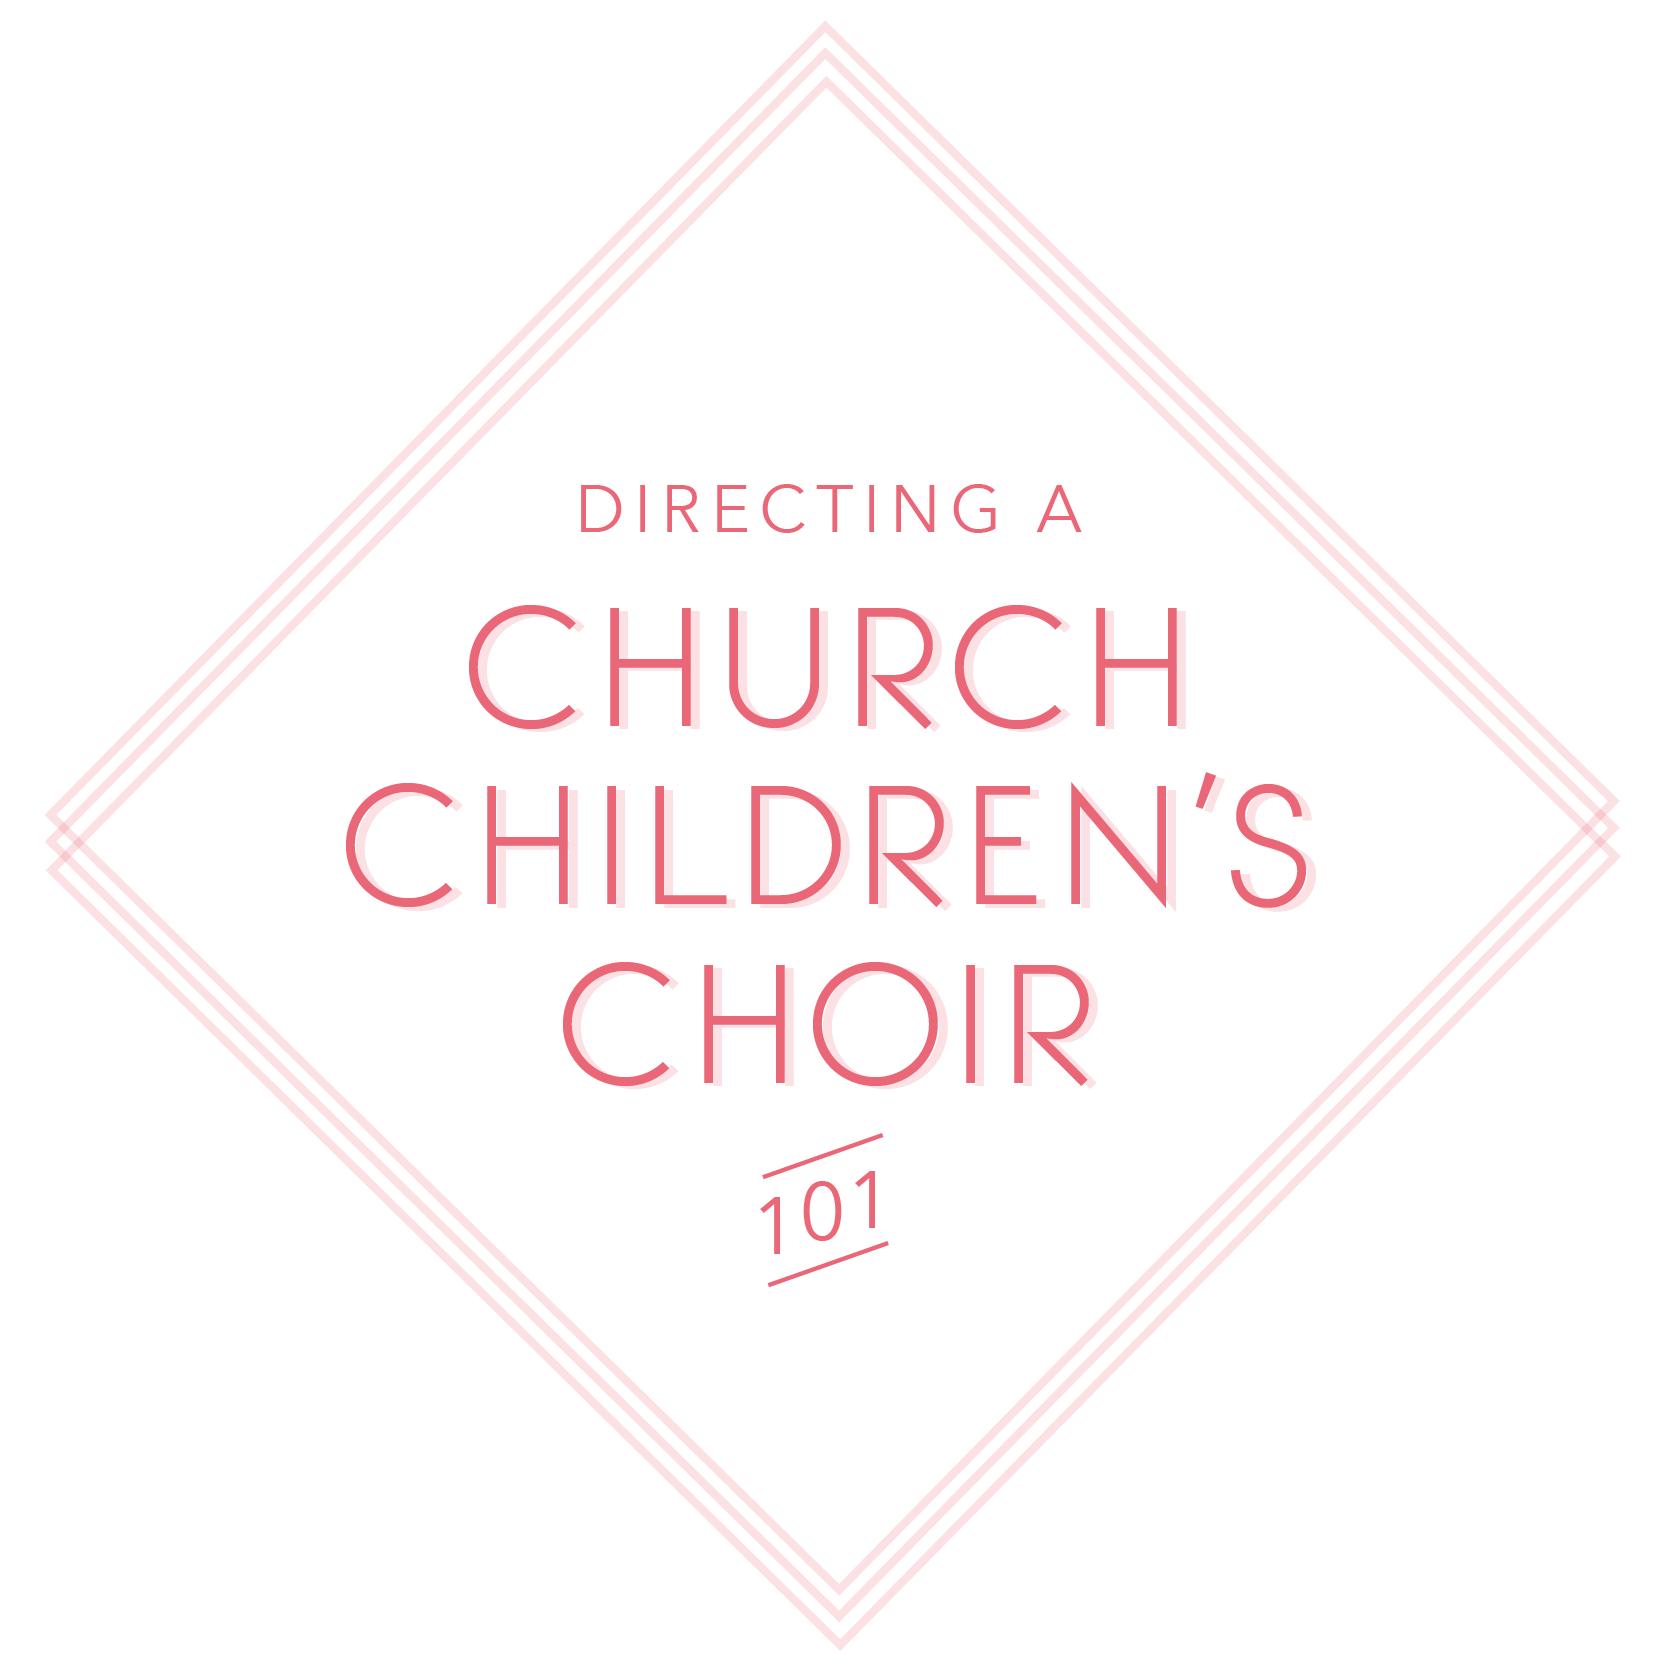 Directing a Church Children's Choir-04.png